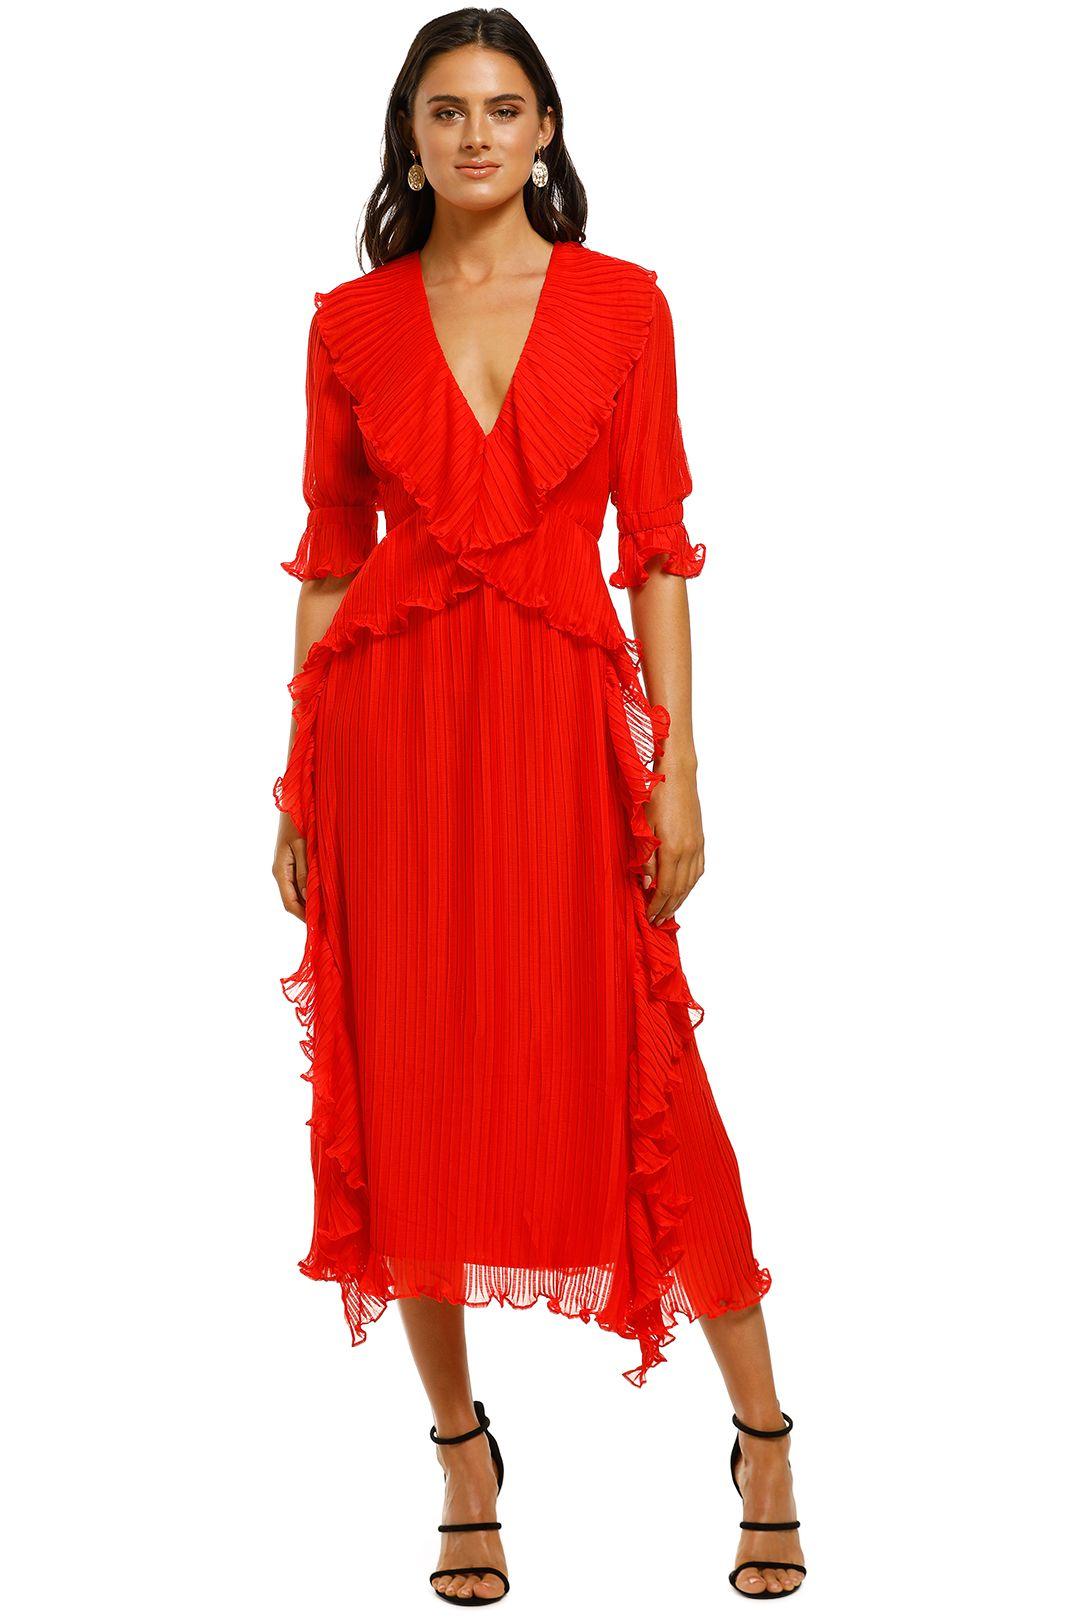 Talulah-Sweet-Sugar-Midi-Dress-Red-Front